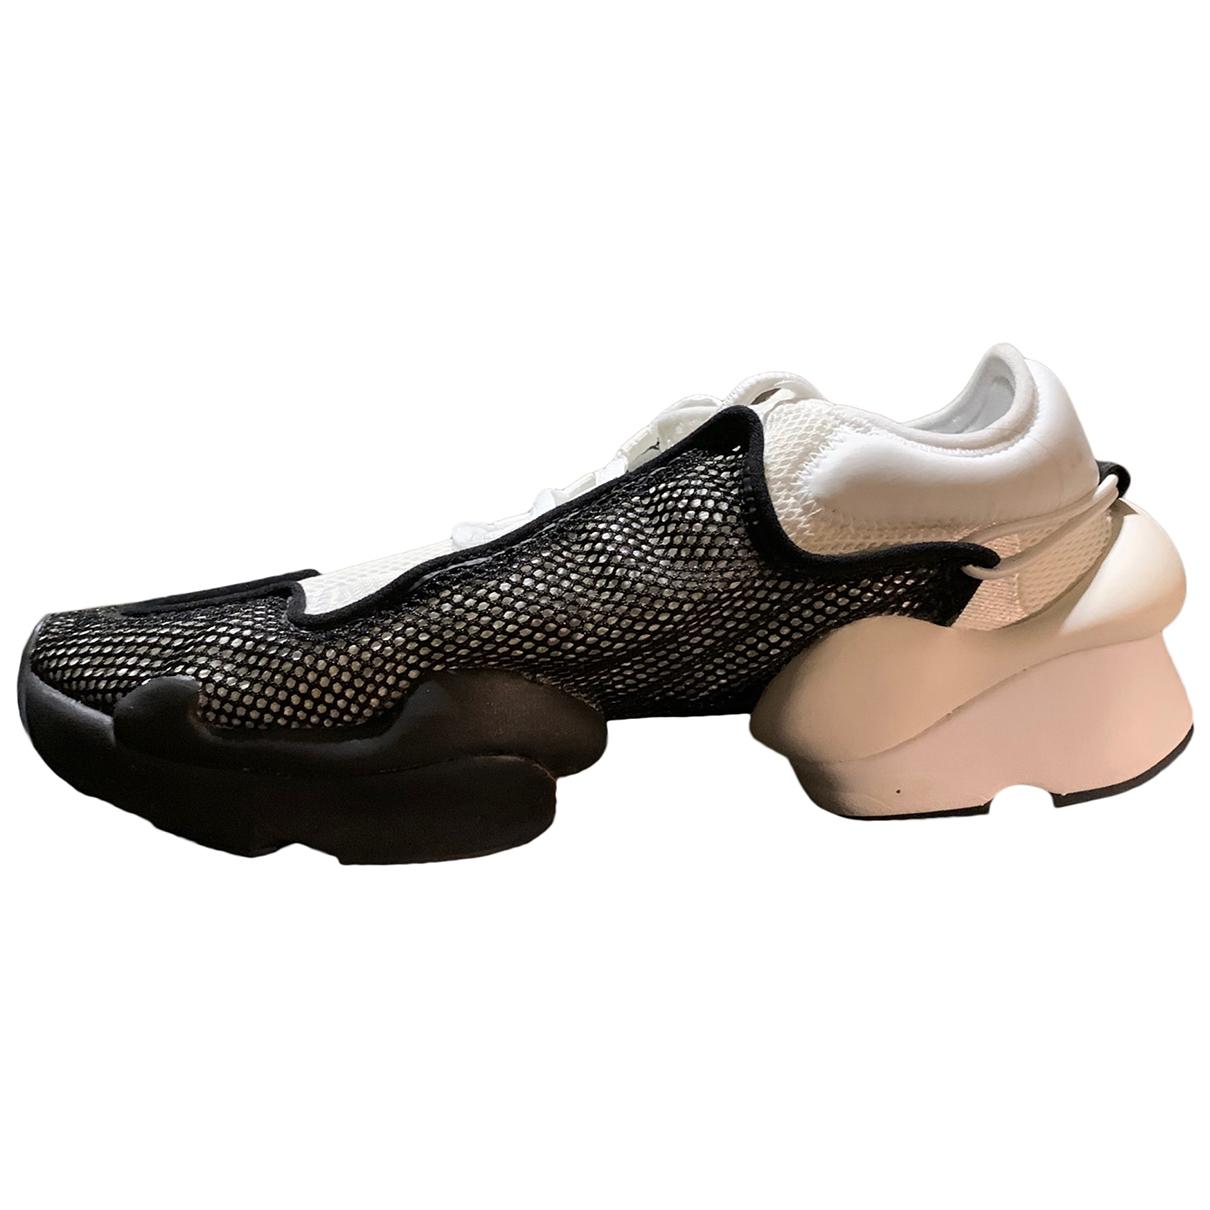 Y-3 \N Sneakers in  Weiss Leinen